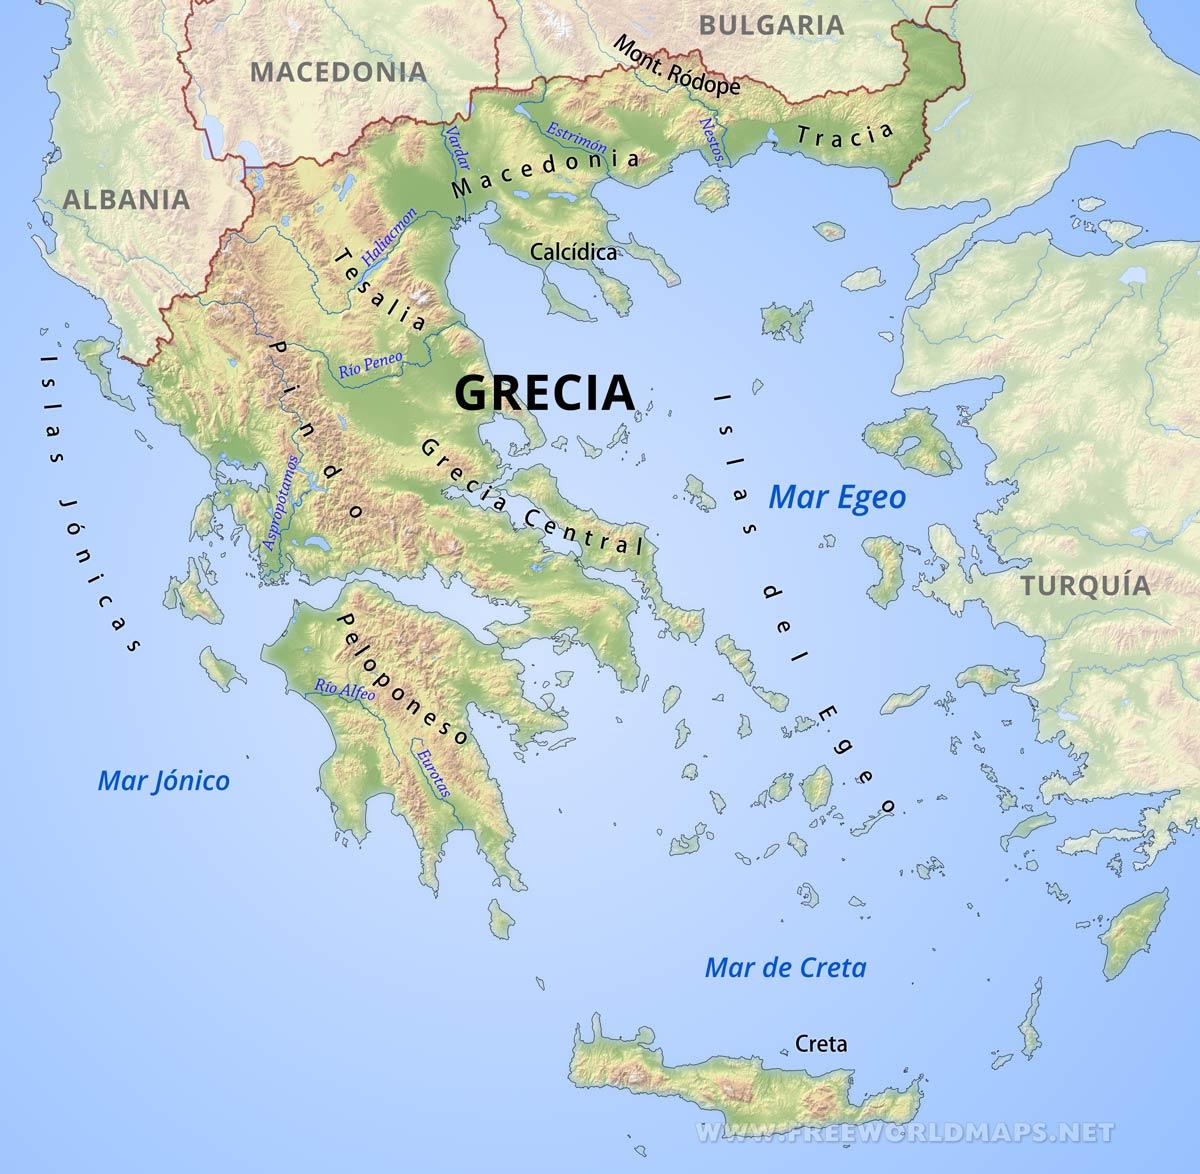 grecia no mapa Mapa de Grecia grecia no mapa